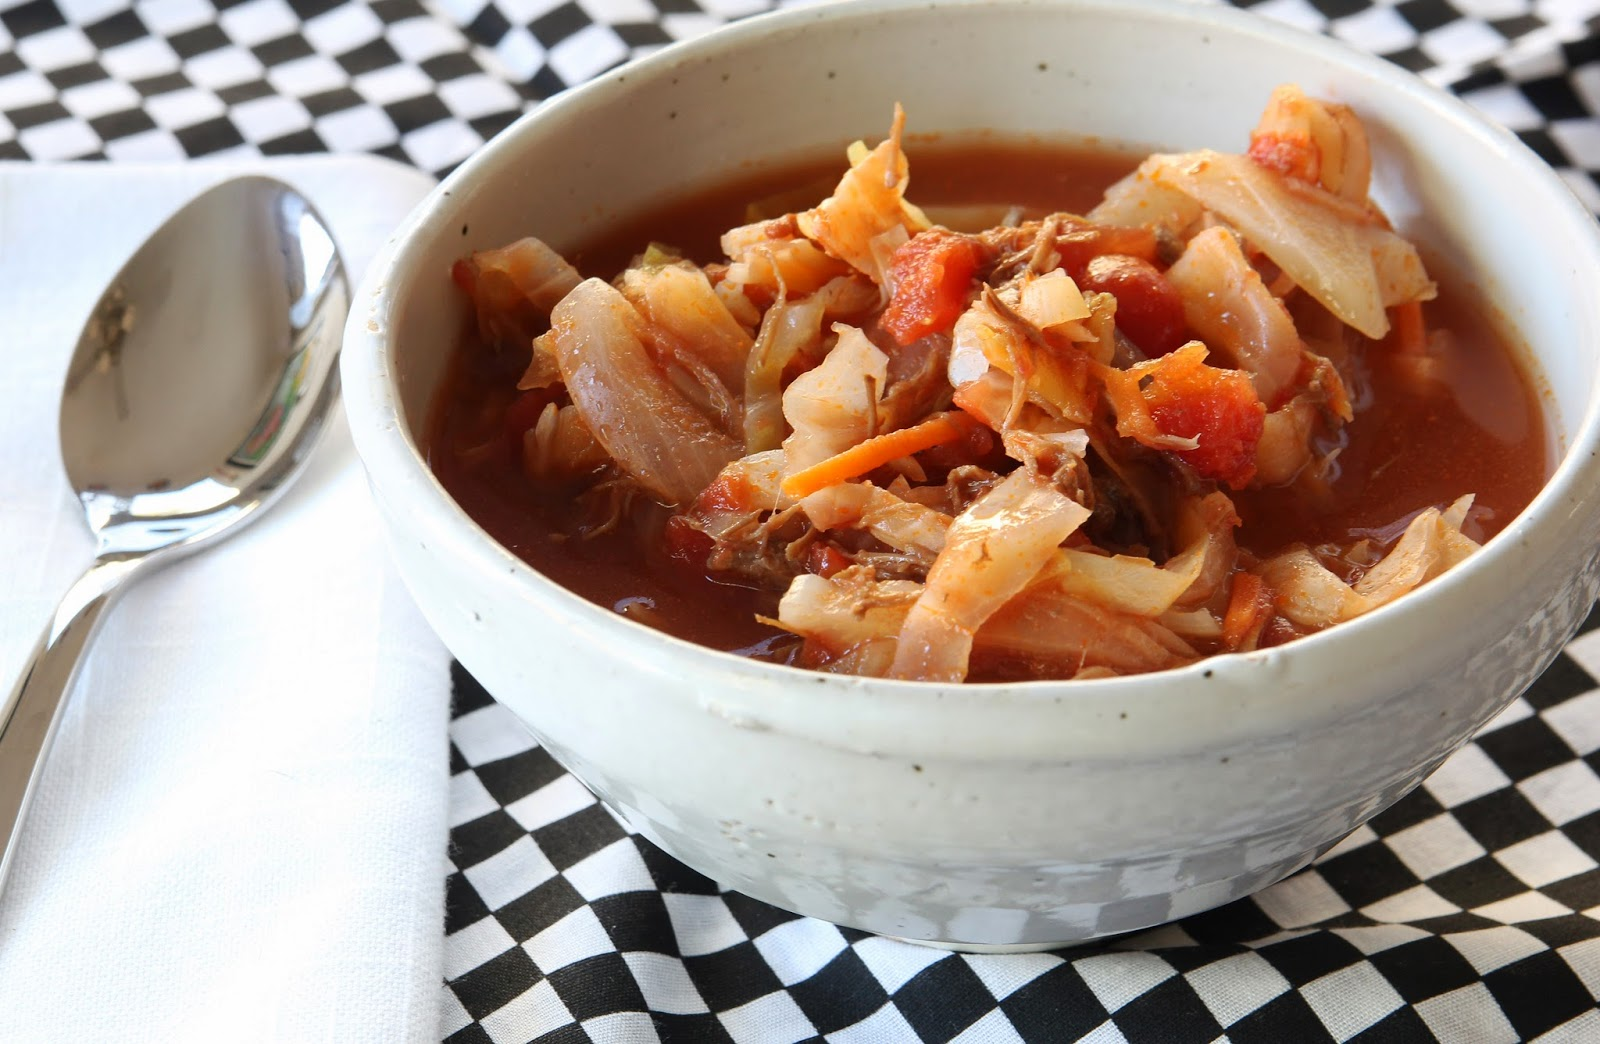 سوپ ترش و شیرین کلم